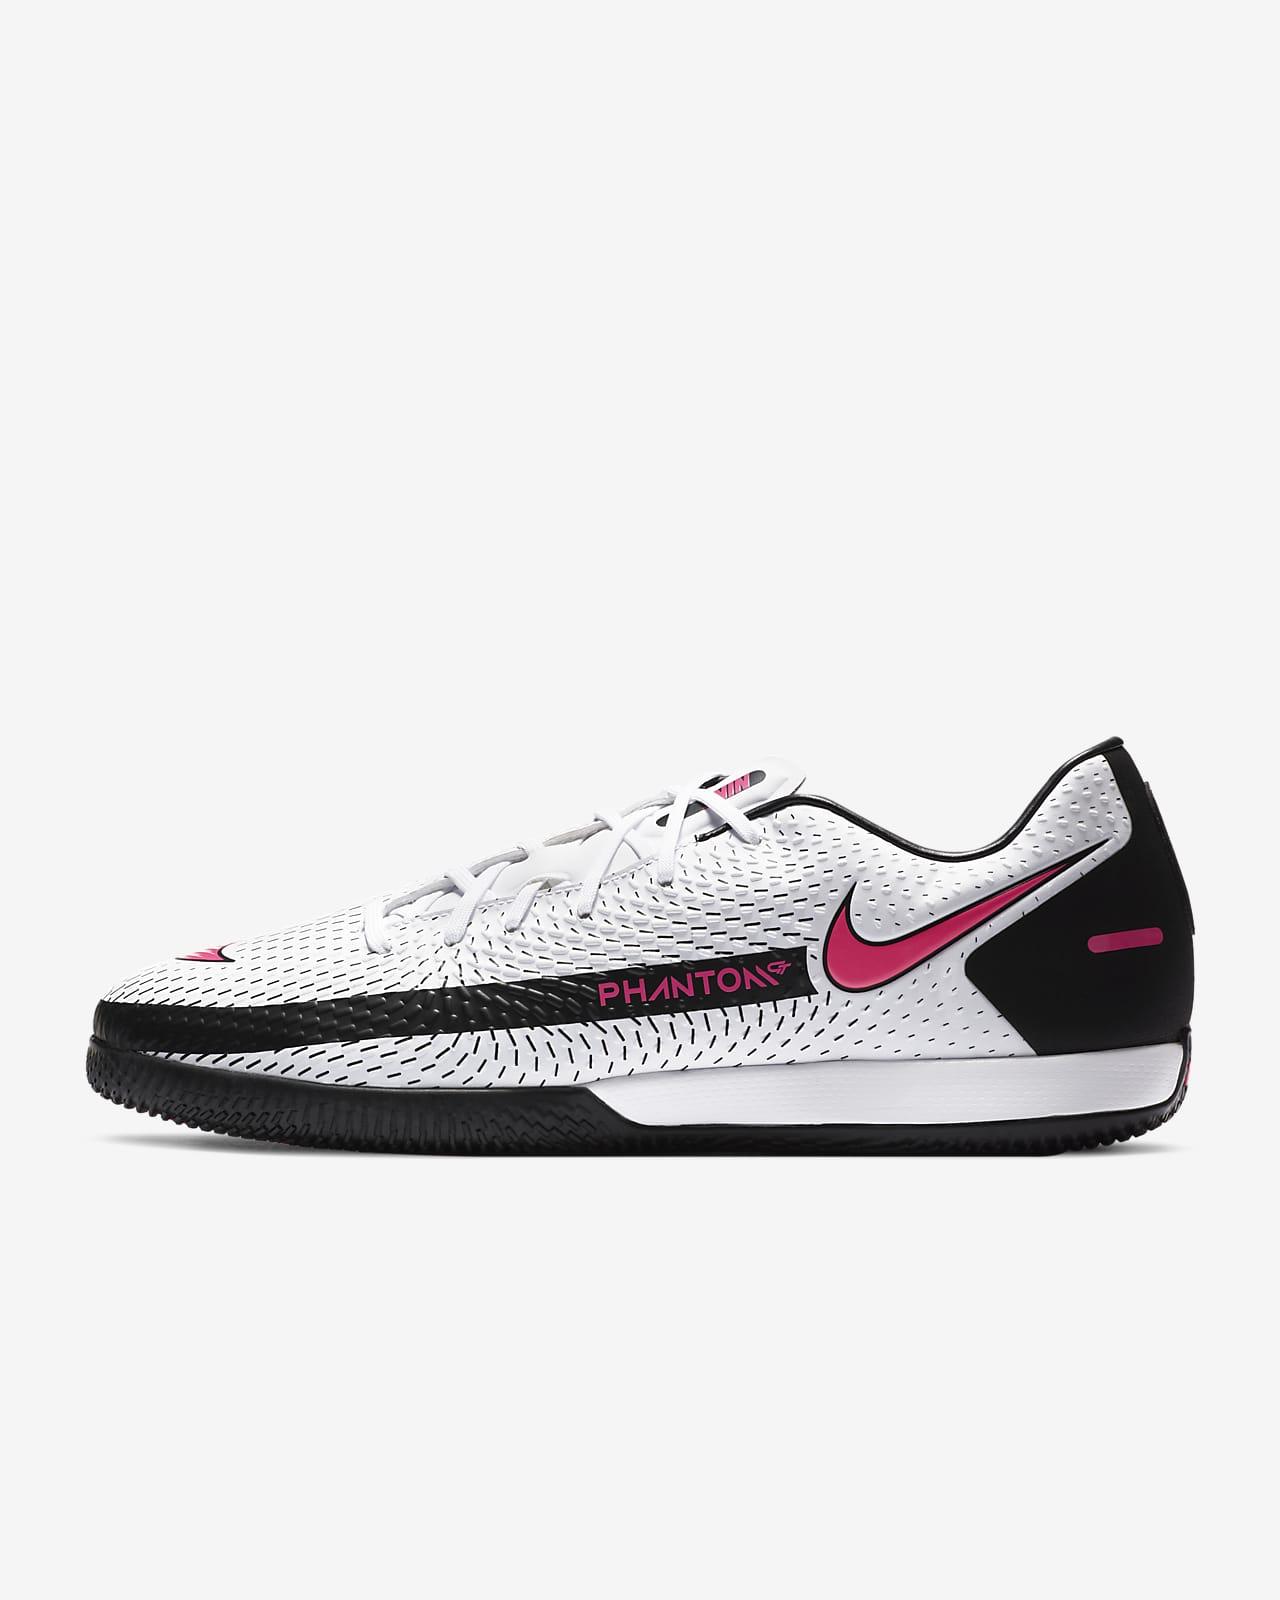 Nike Phantom GT Academy IC Indoor/Court Soccer Shoe